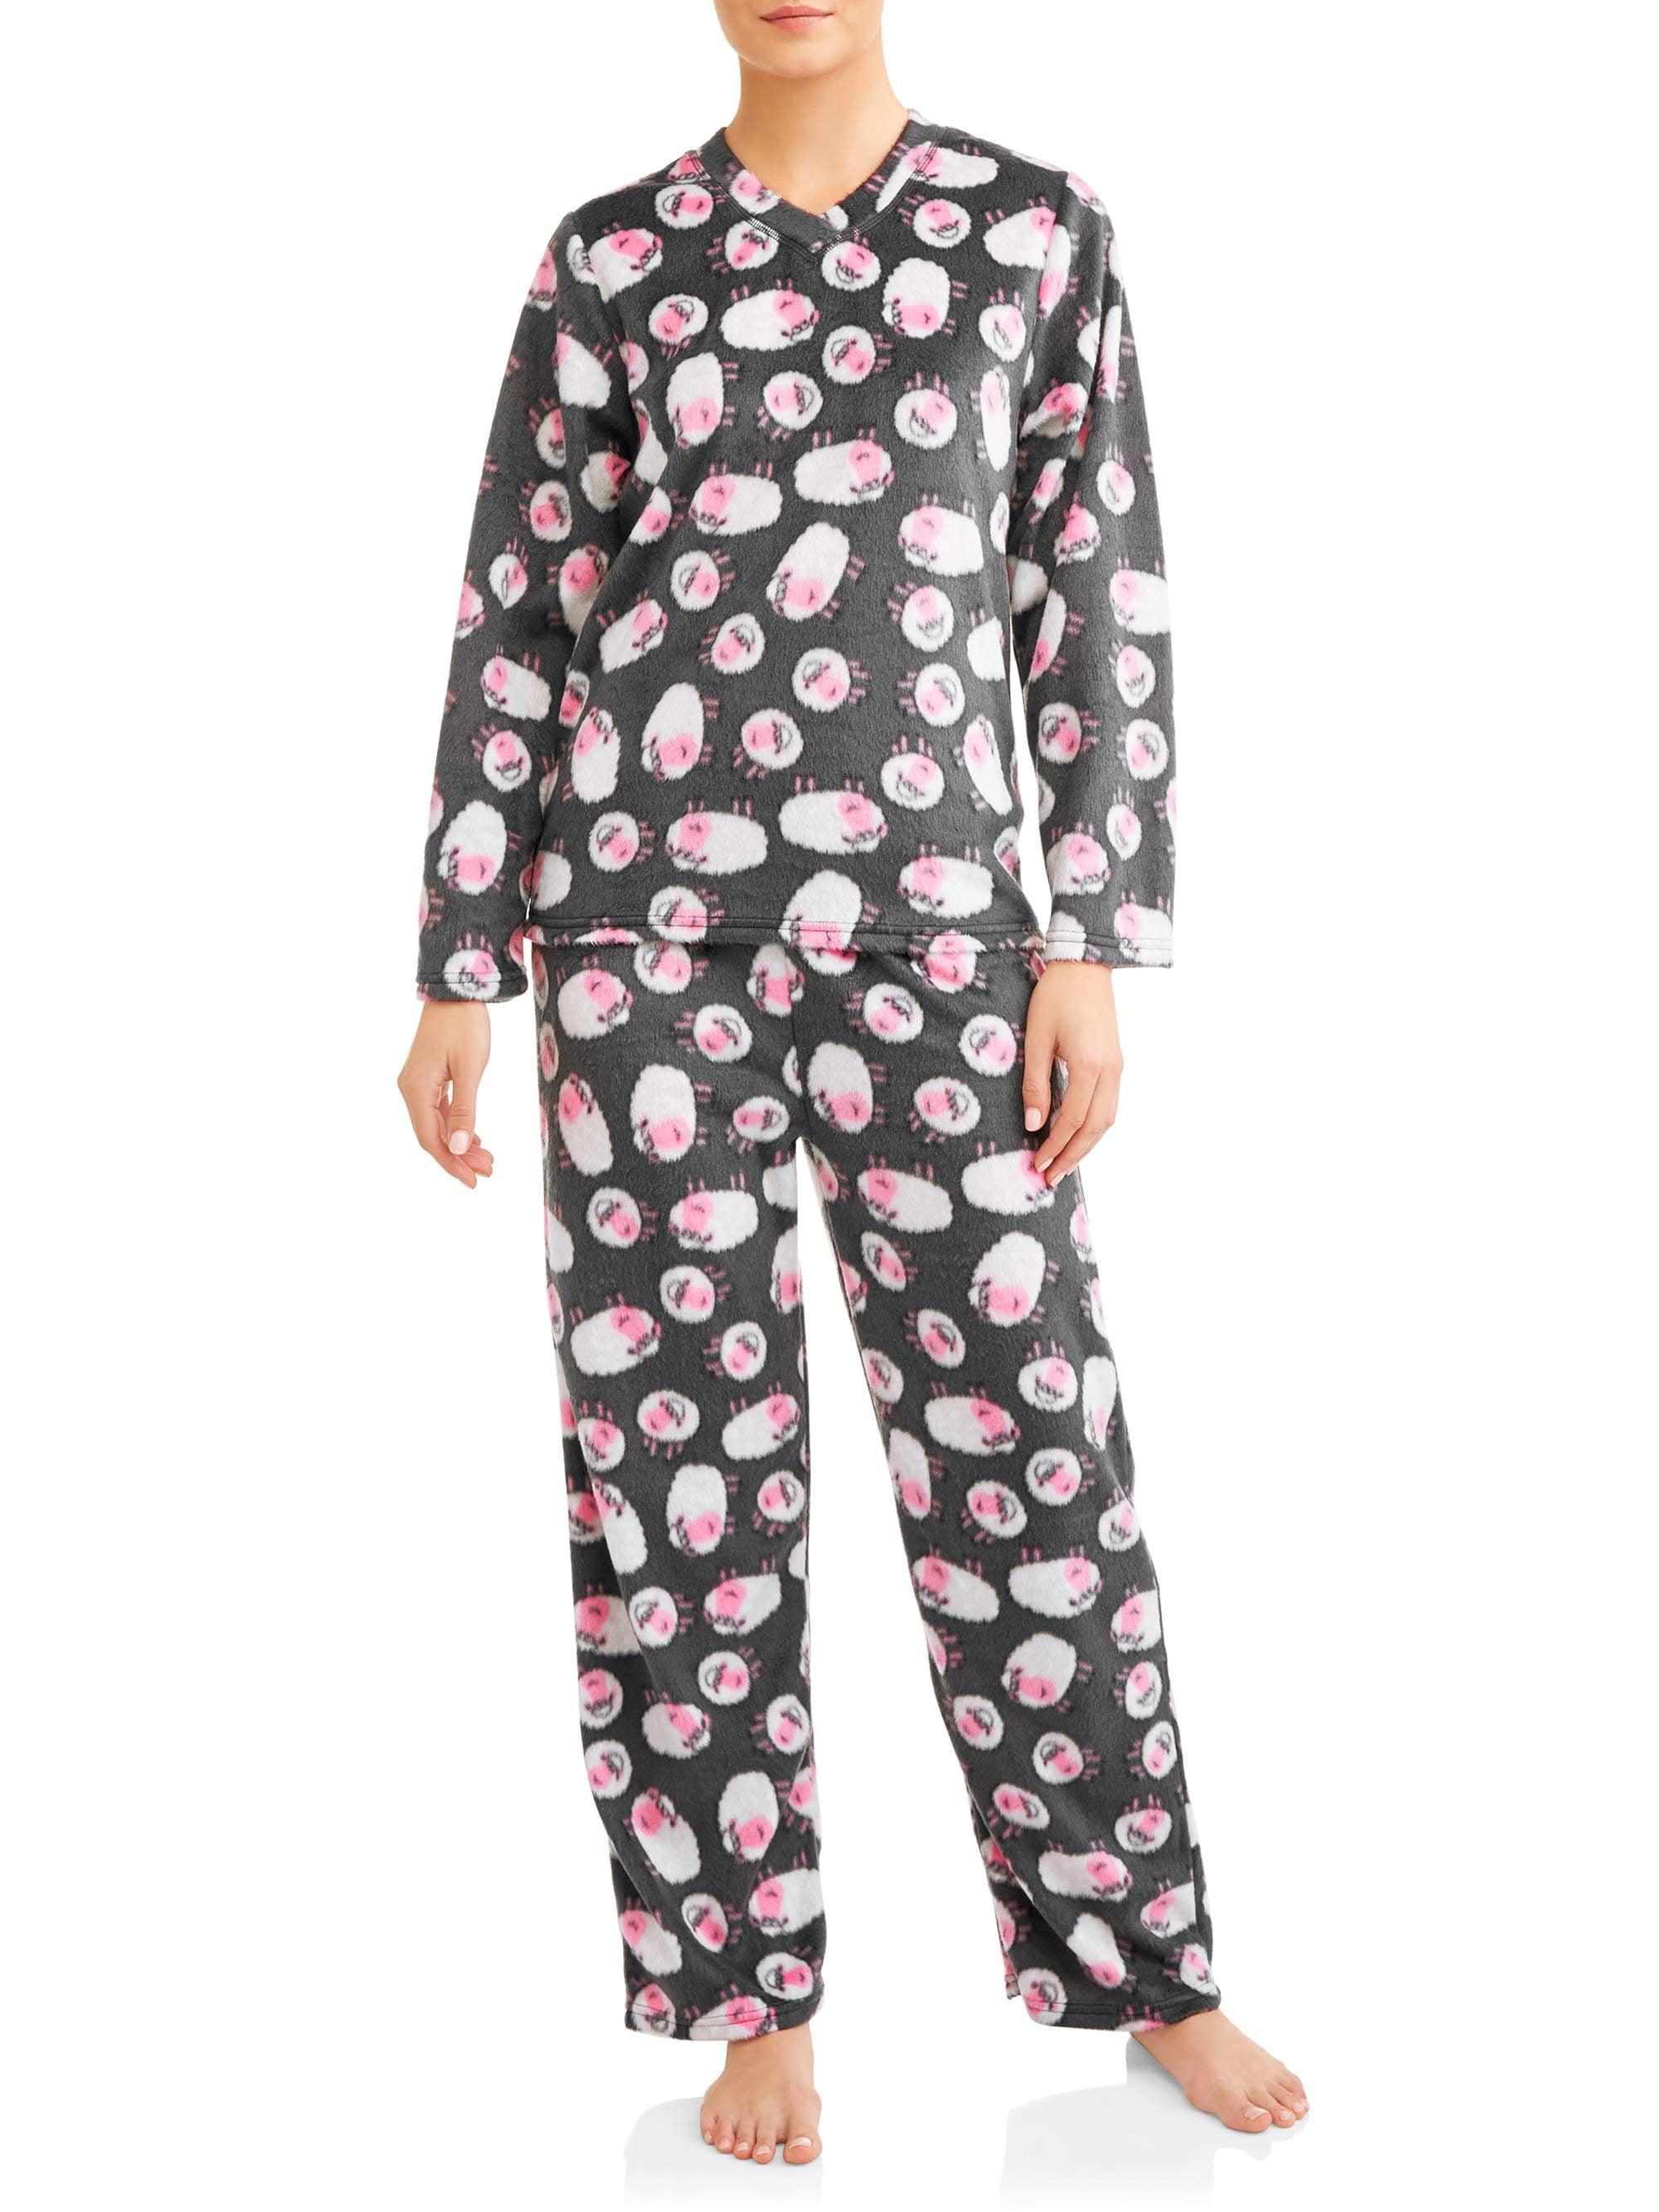 Mayfair Women's and Women's Plus Minky Fleece 2-Piece Pajama Set